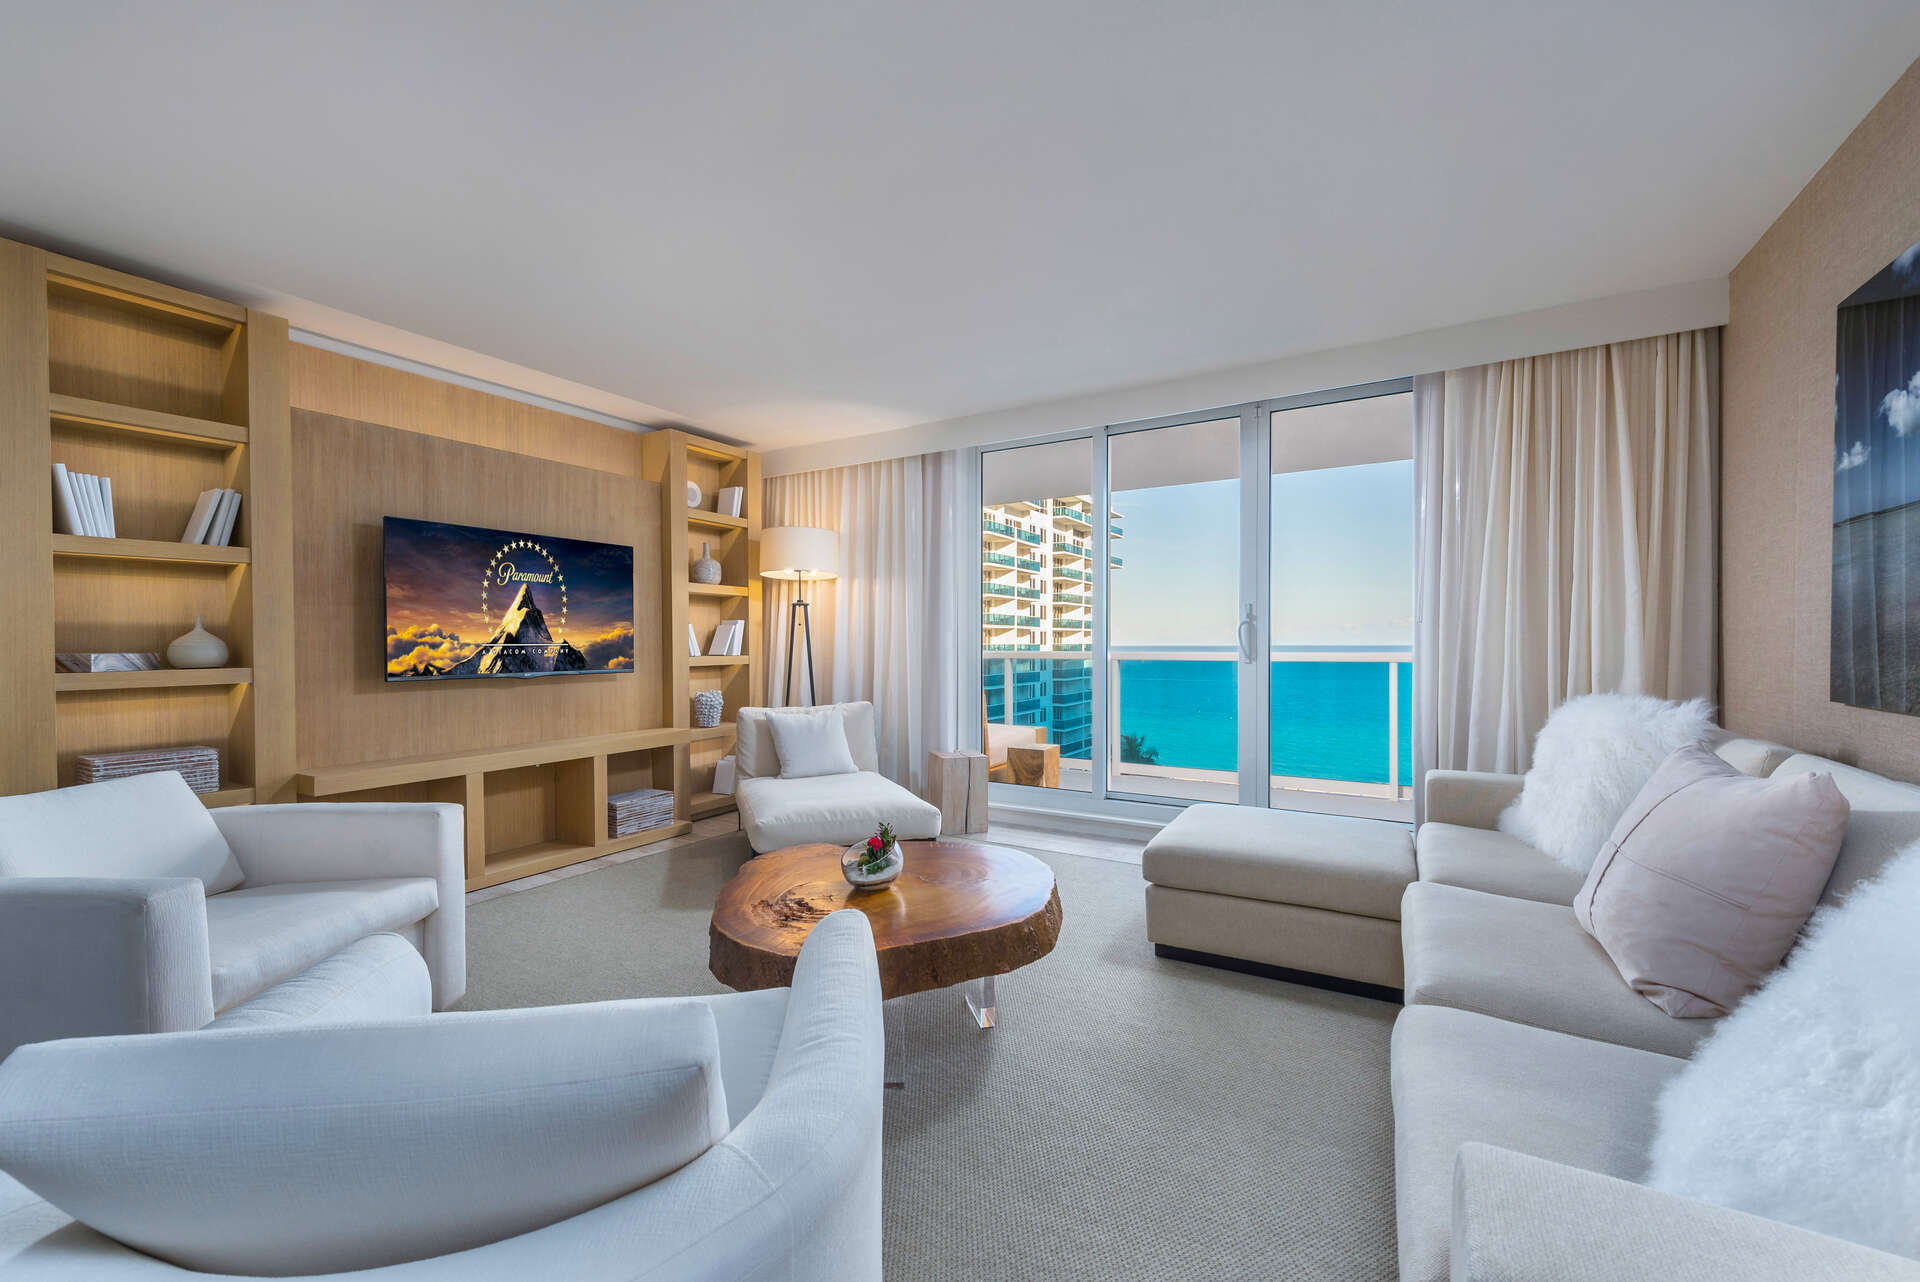 Luxury vacation rentals usa - Florida - Miami beach - Eco hotel southbeach - #1144 | 3 BDM Oceanfront - Image 1/12